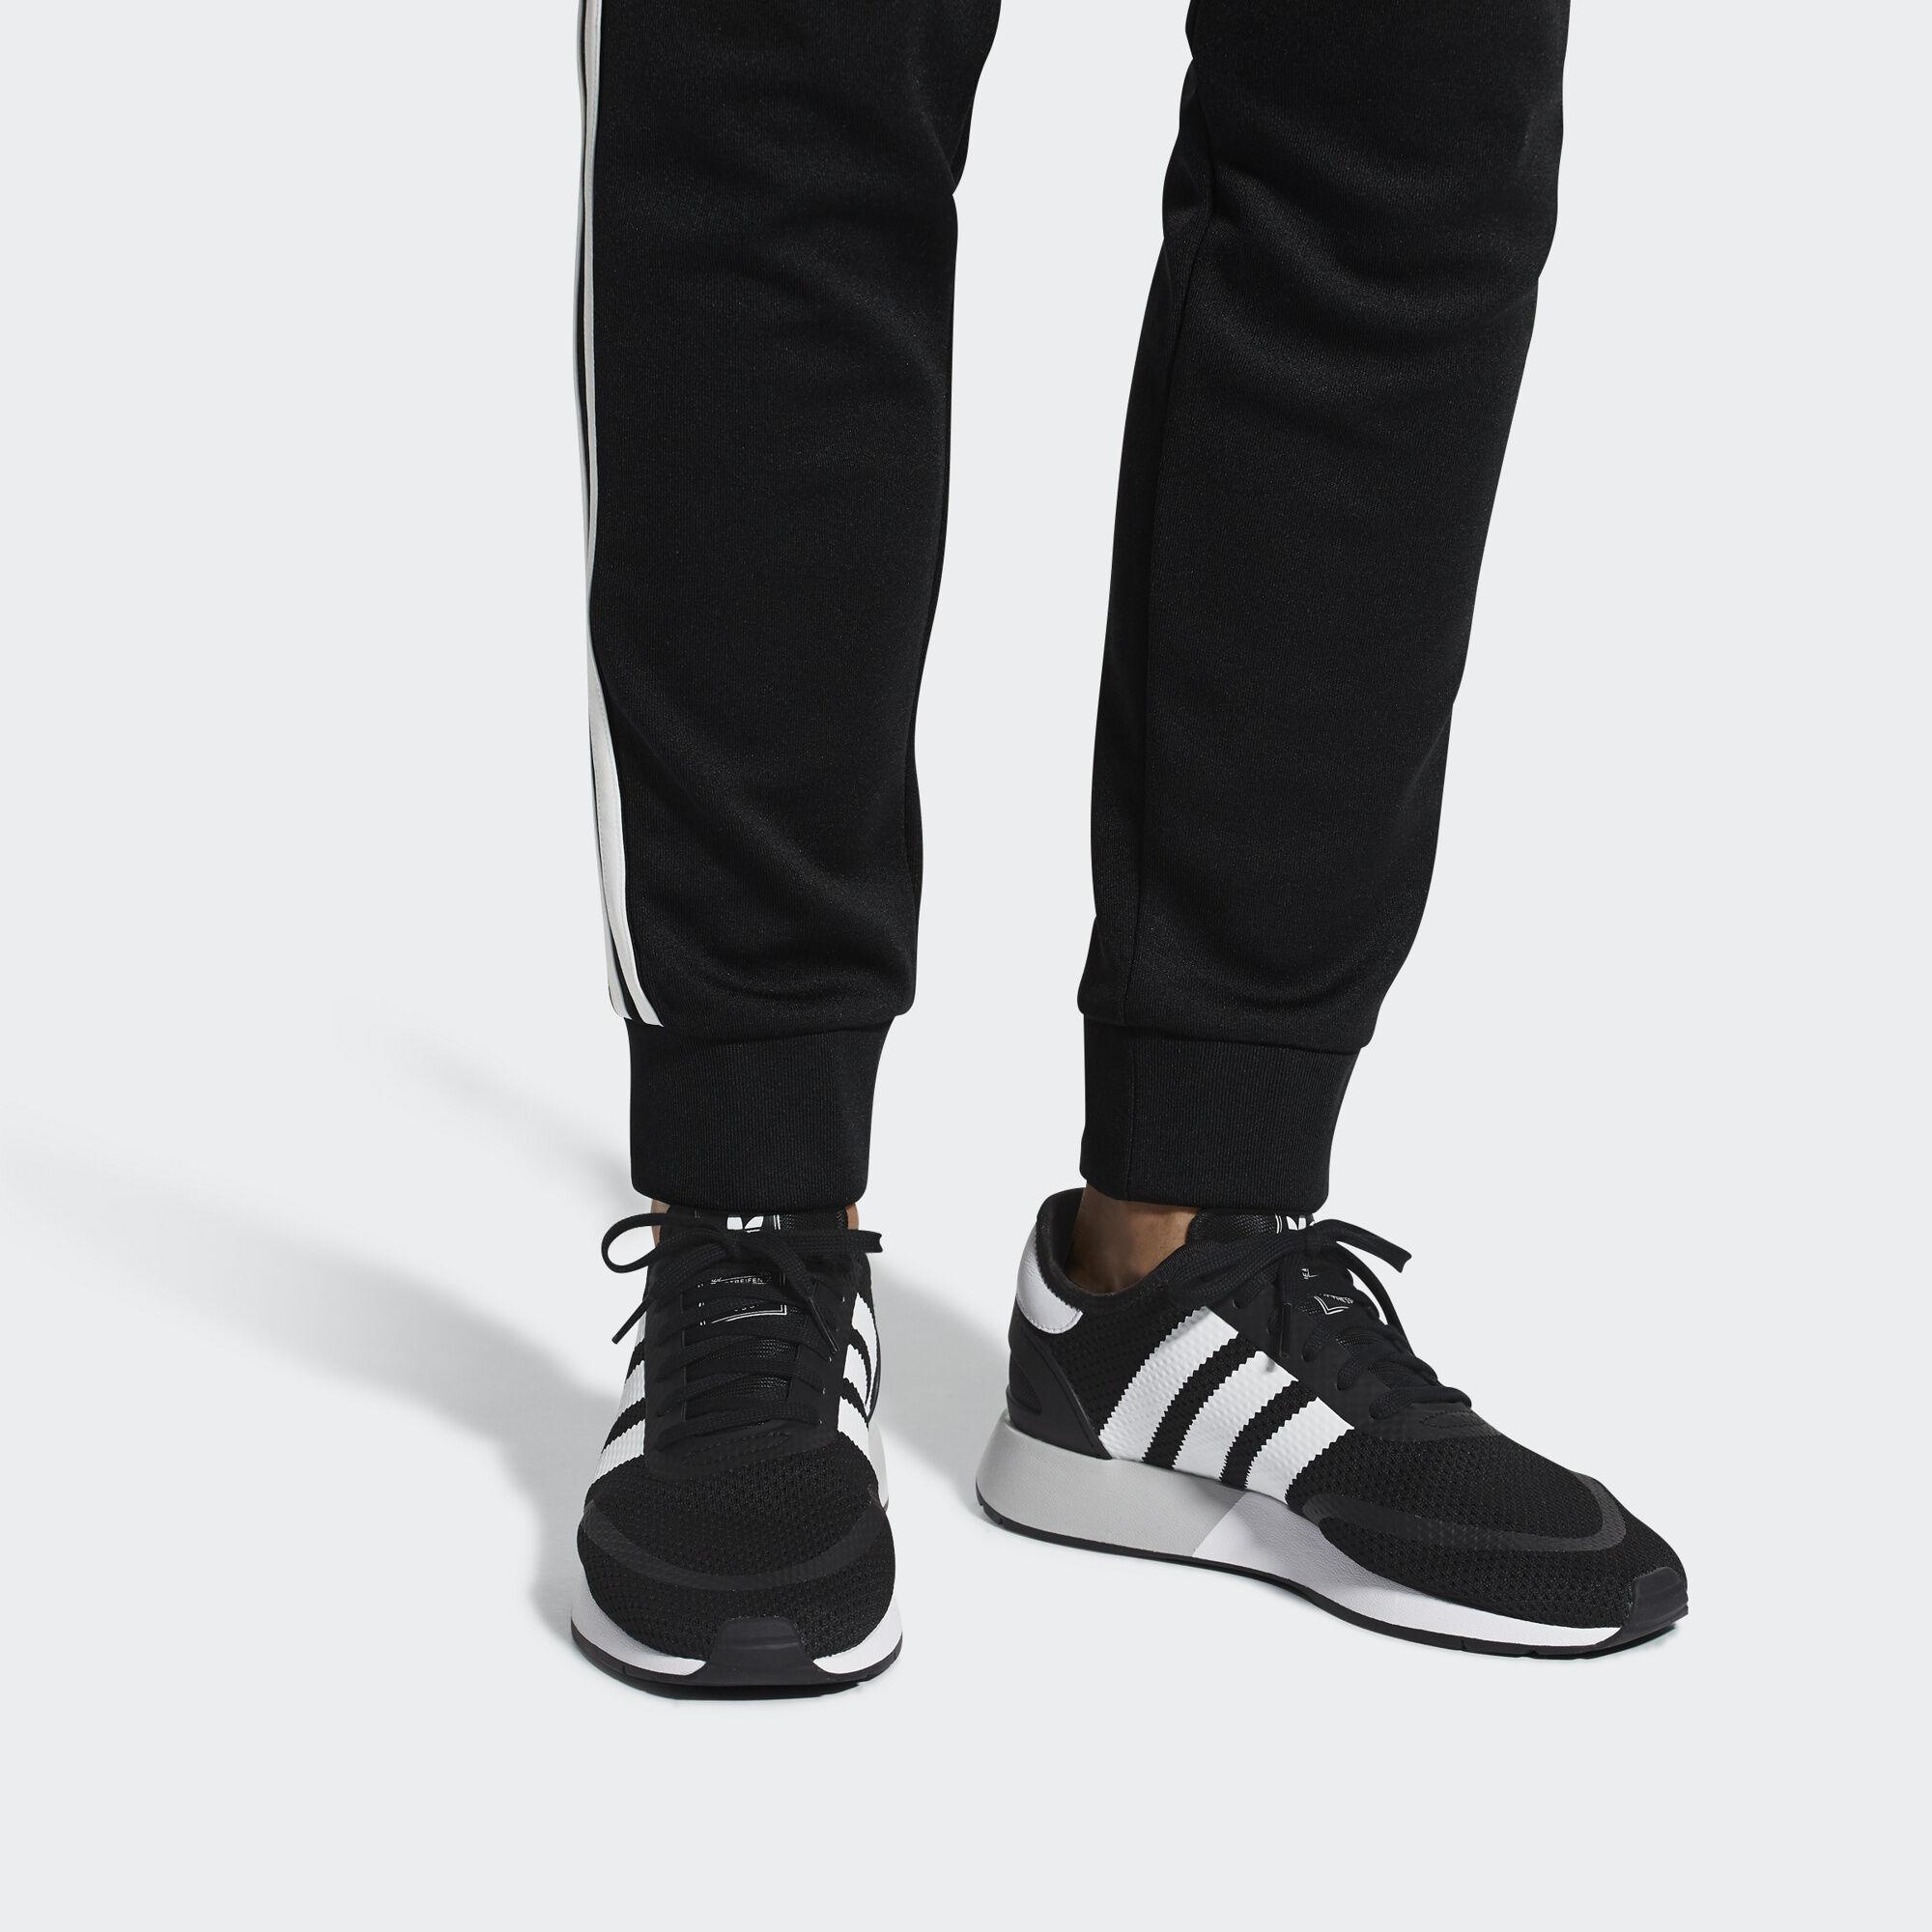 4d73764a723b adidas N-5923 - Black